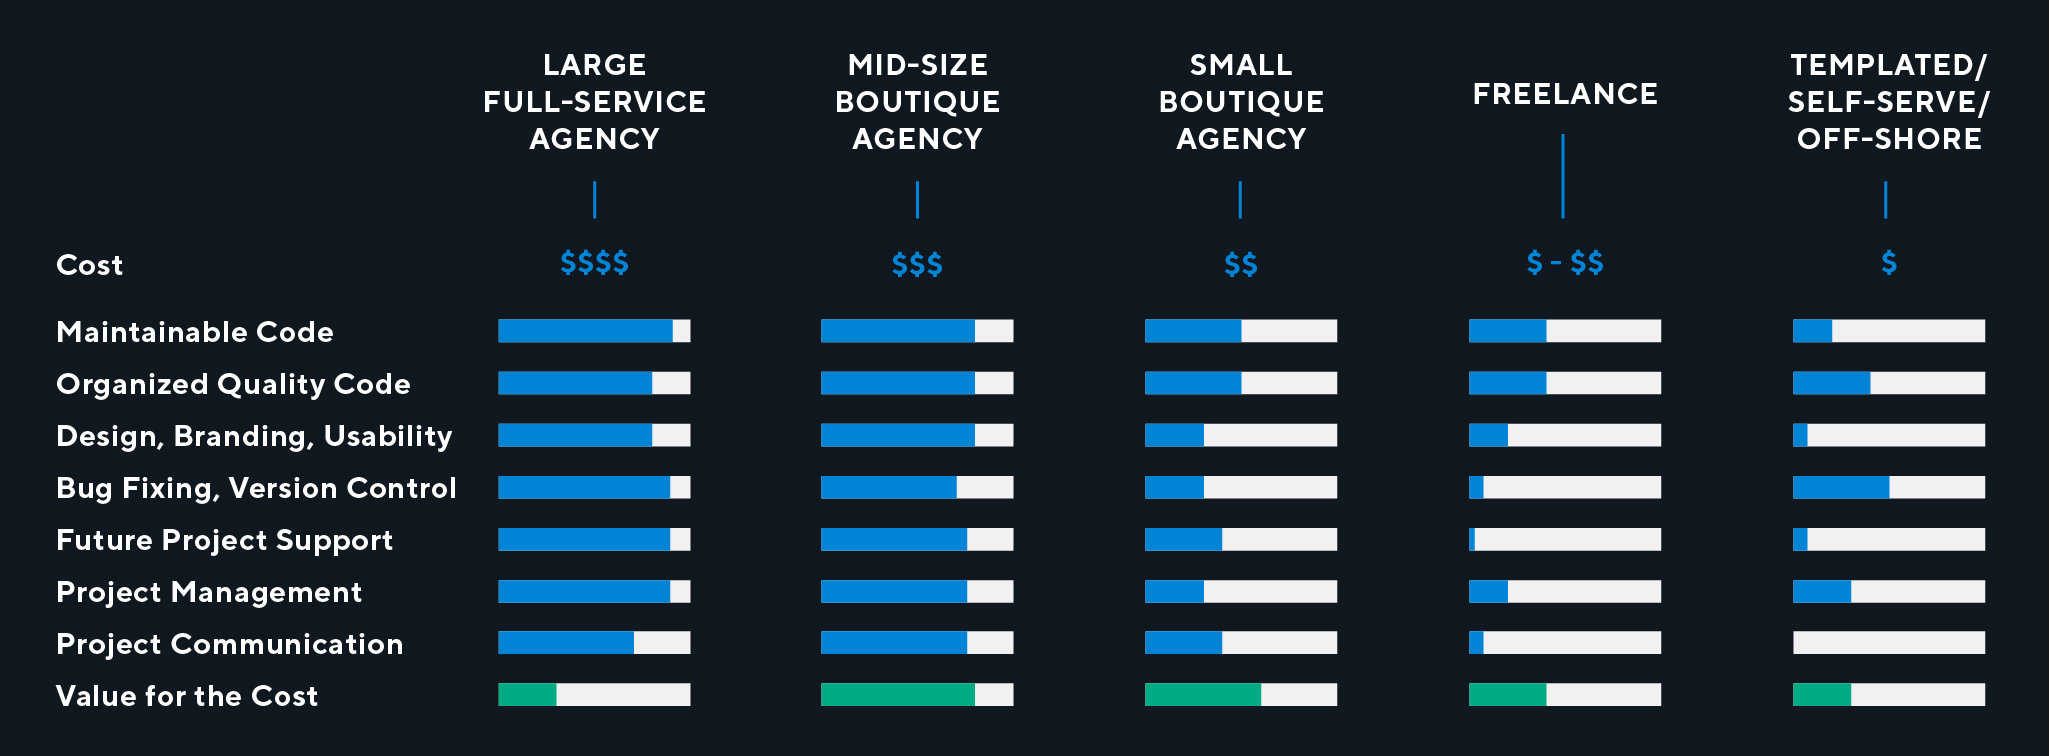 Agency value per cost of website design.